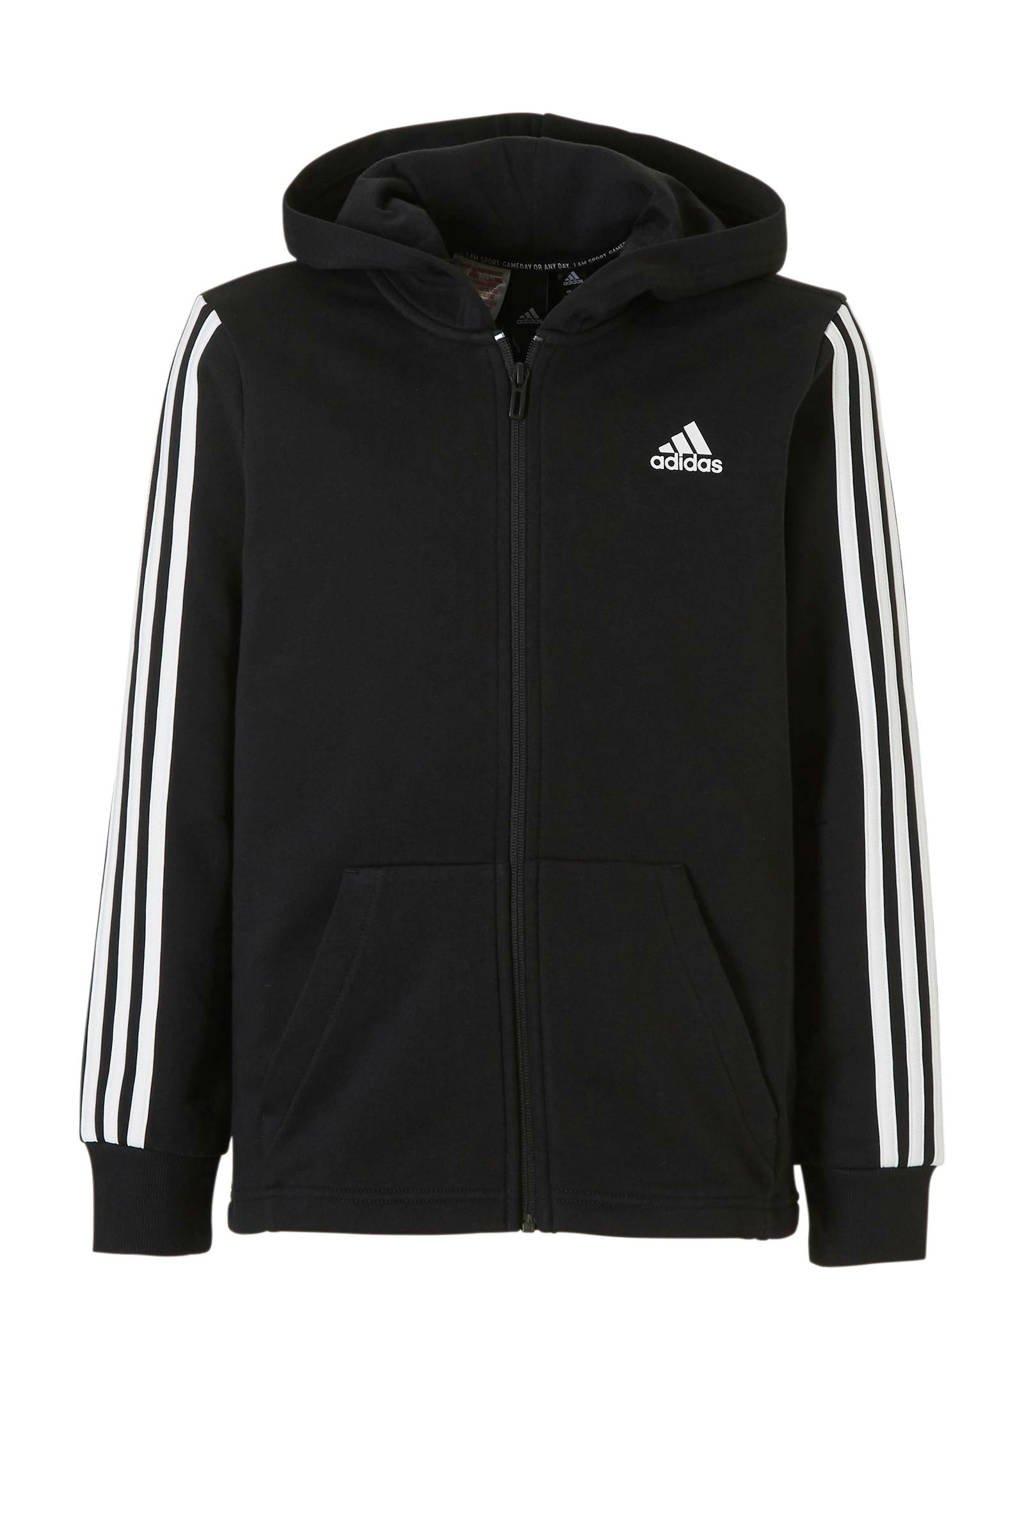 adidas performance   sportvest zwart, Zwart/wit